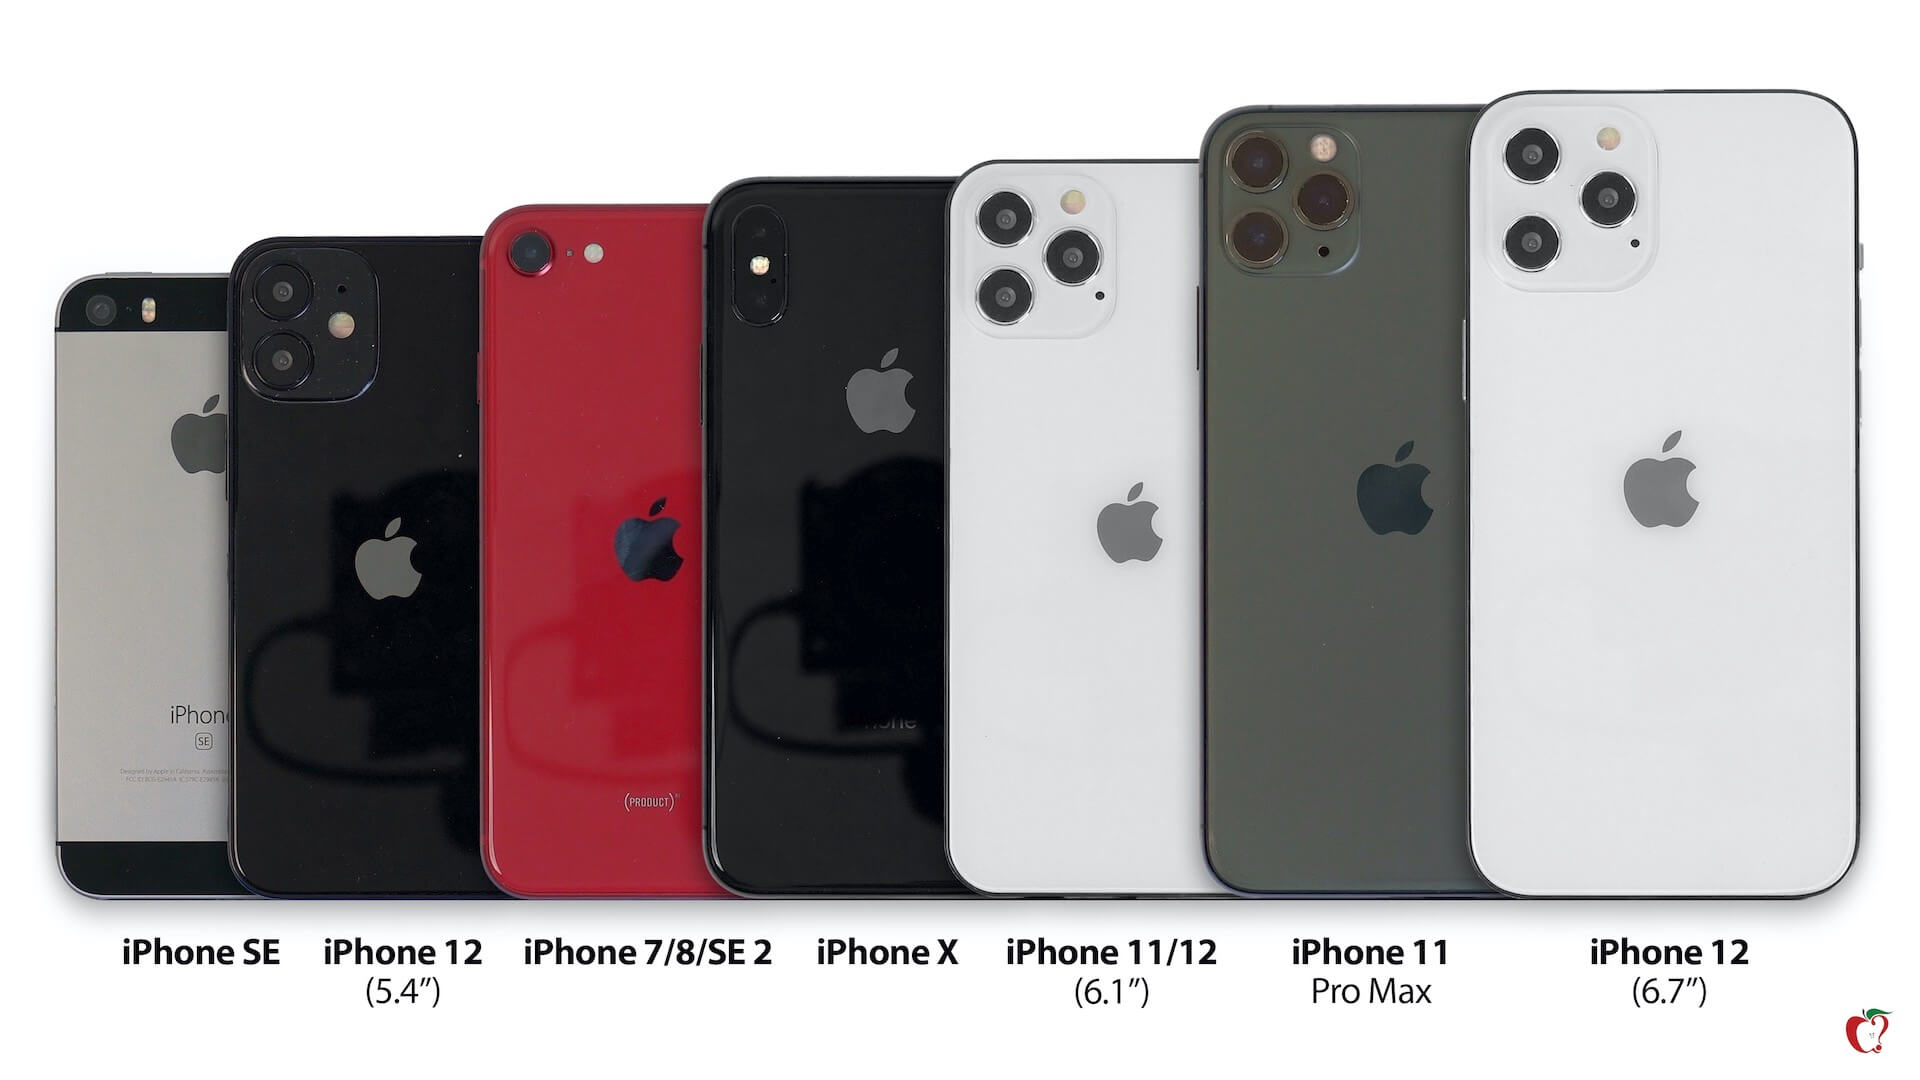 iPhone 12シリーズの全サイズのモックアップと歴代iPhoneをサイズ比較した画像が公開! tech200708_iphone12_mockup_1